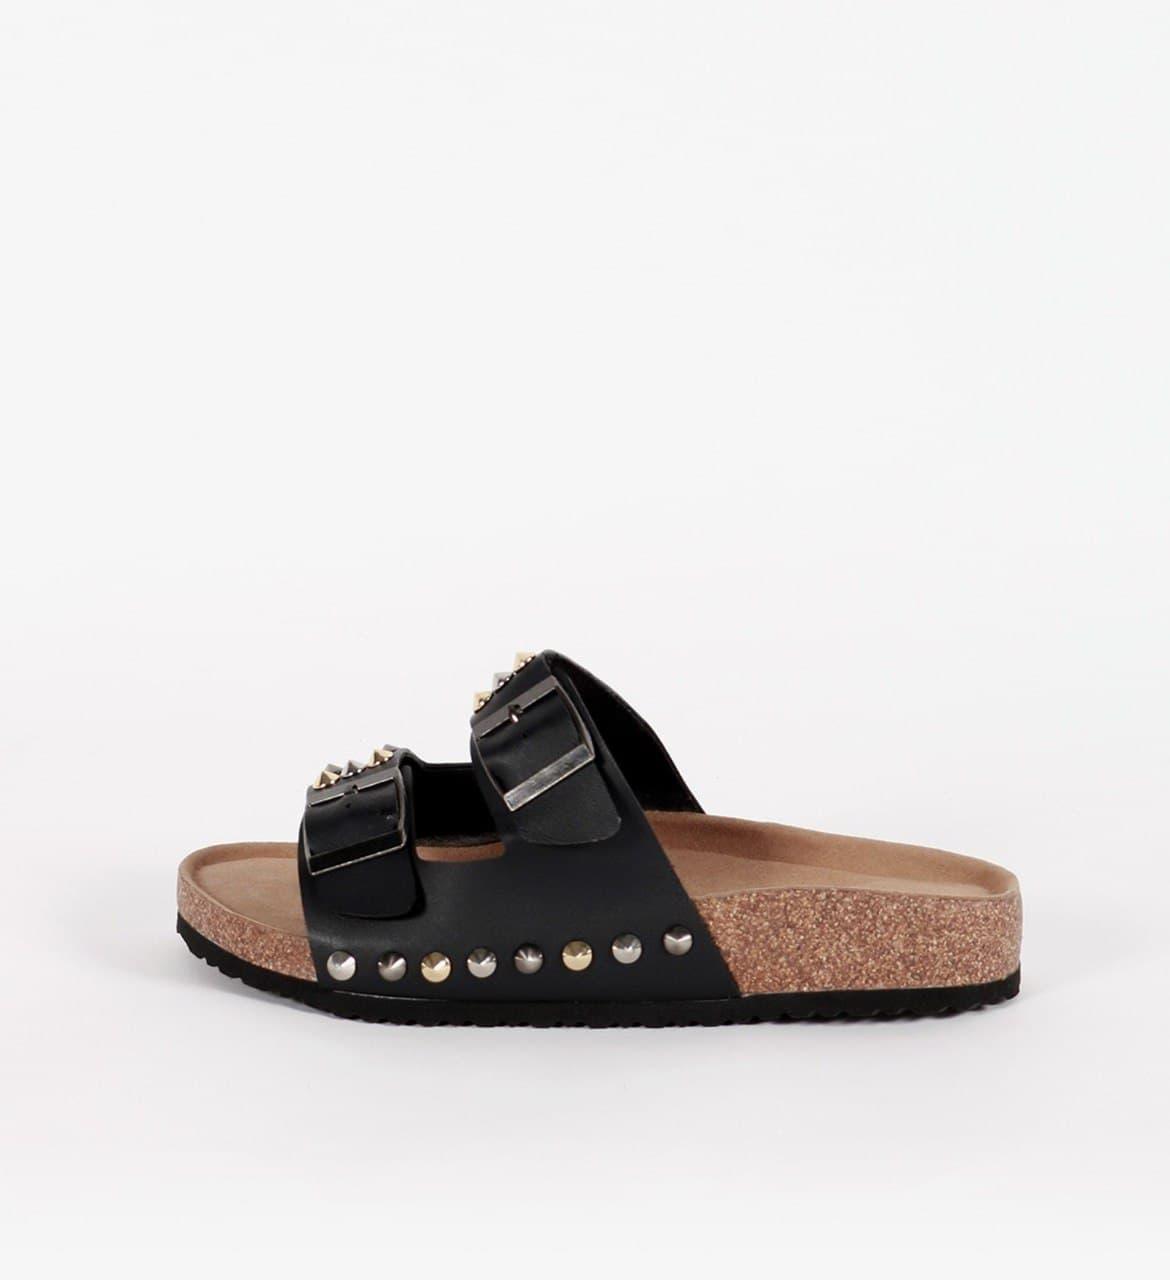 due fasce spikes GIO CELLINI   Sandalo   ST029NE